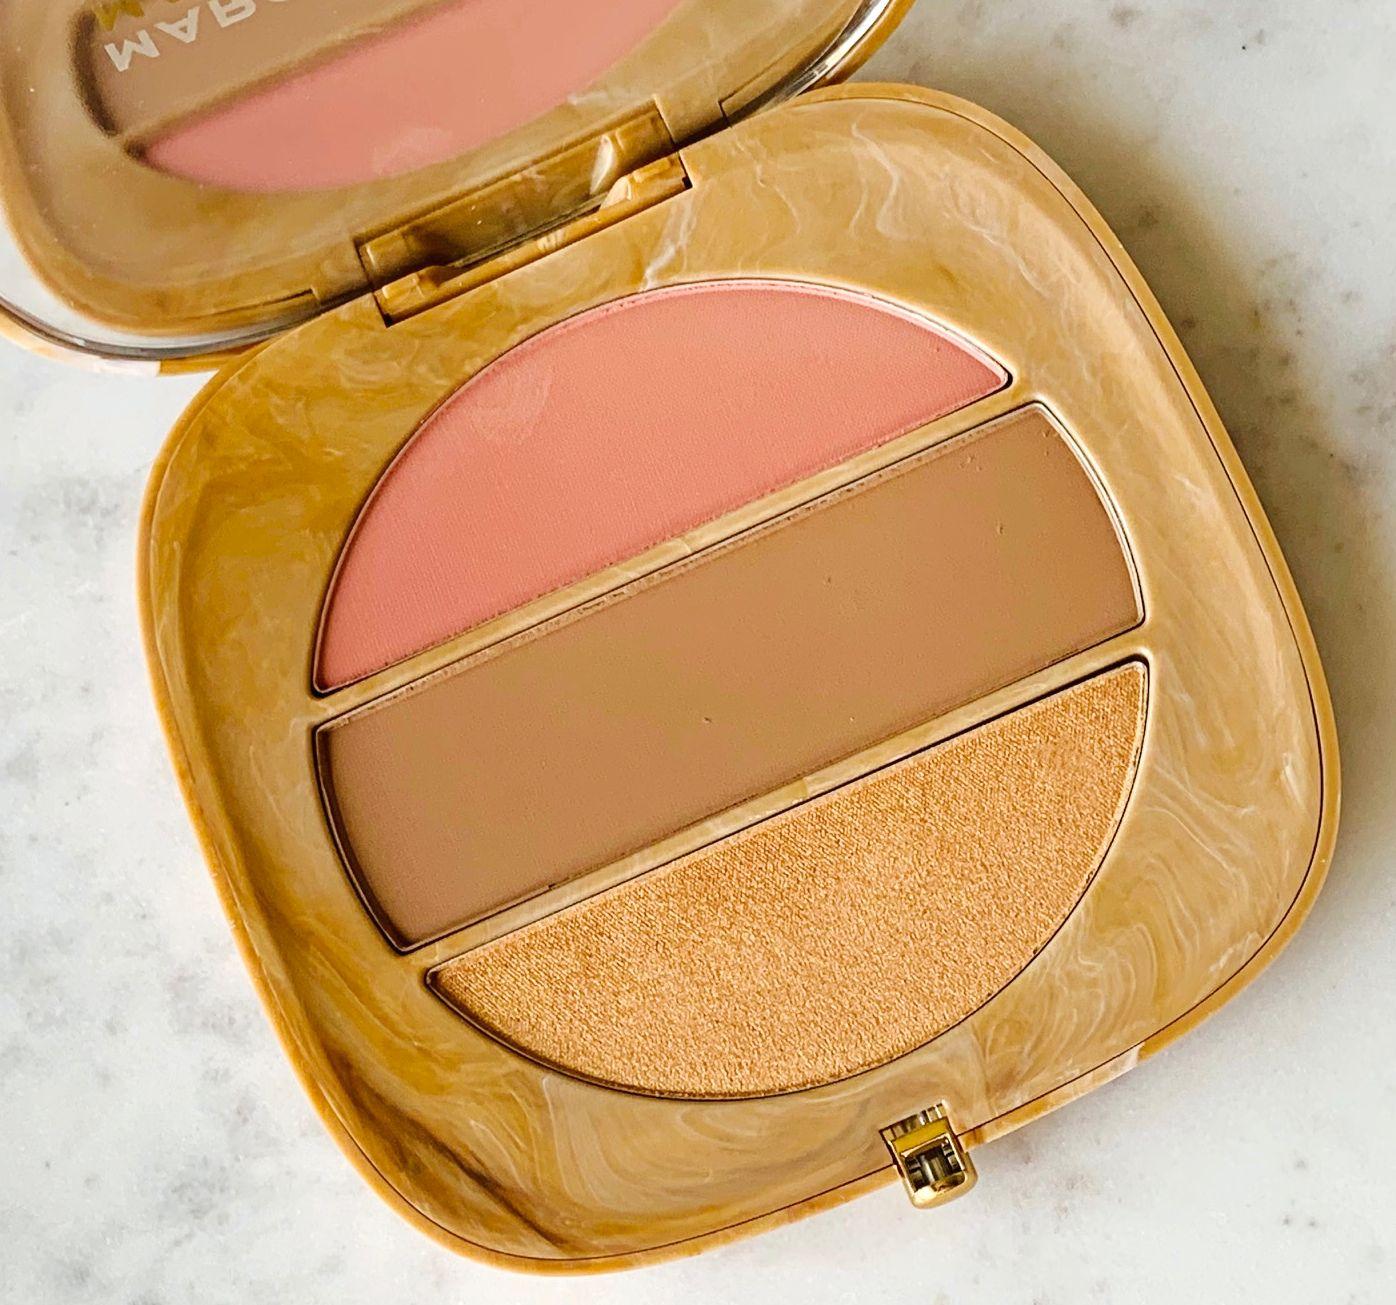 O!Mega X Three Powder Blush-Bronze-Highlight Palette Review